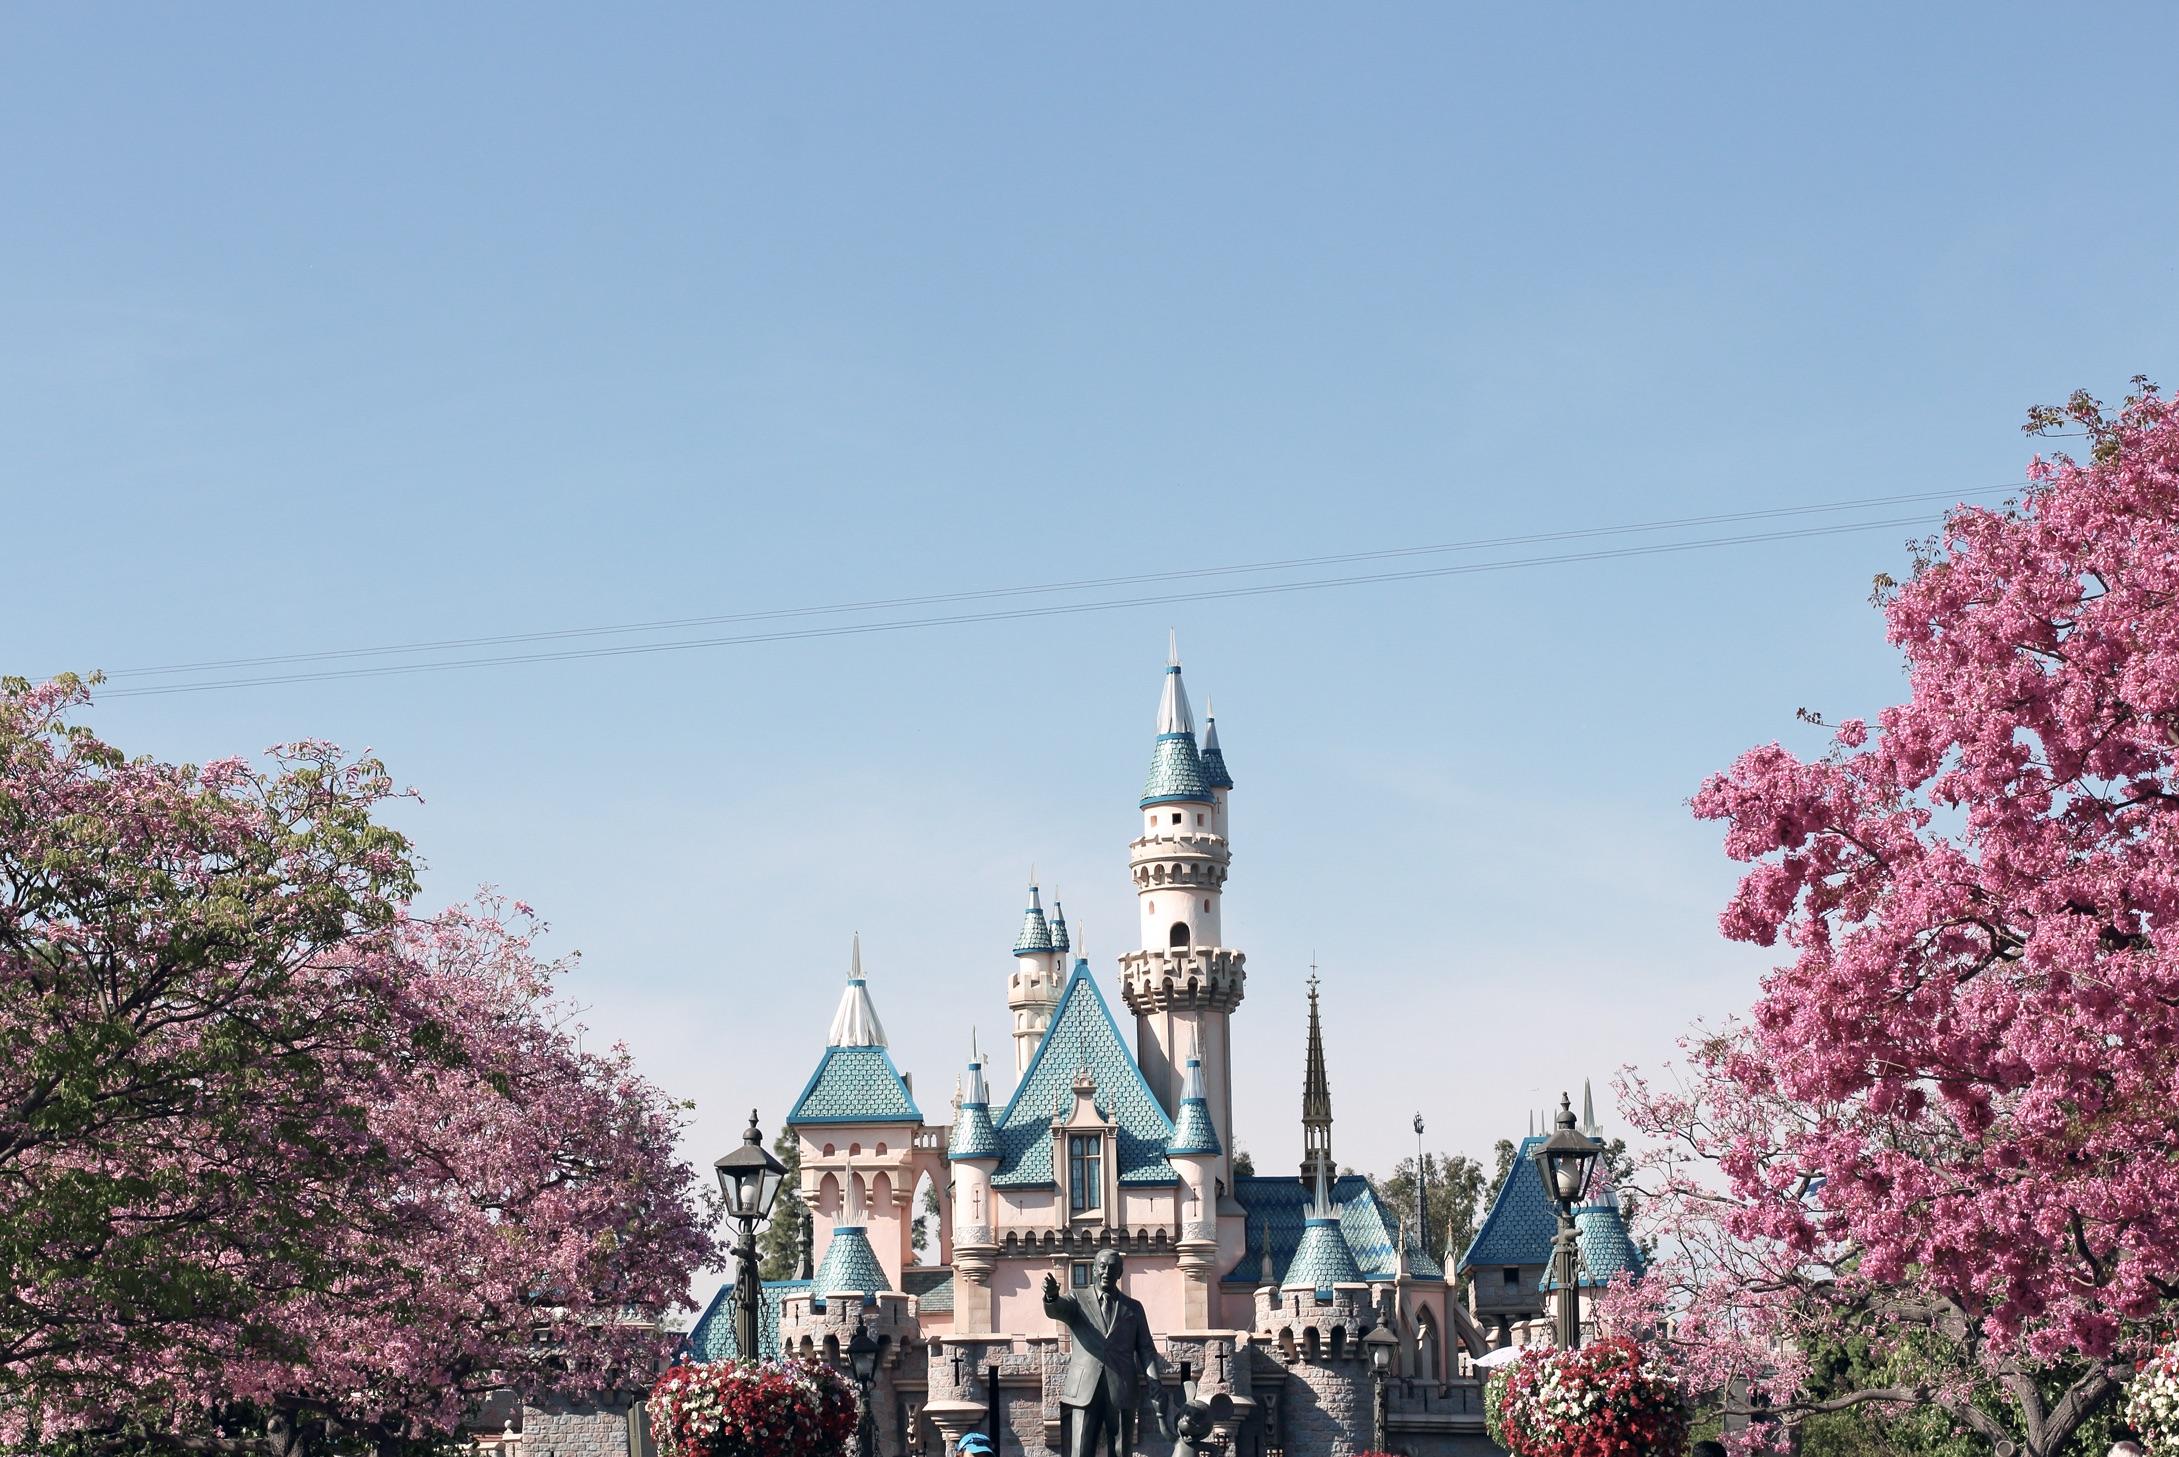 Castle Photo by Sharon Litz (@sharonlitz).